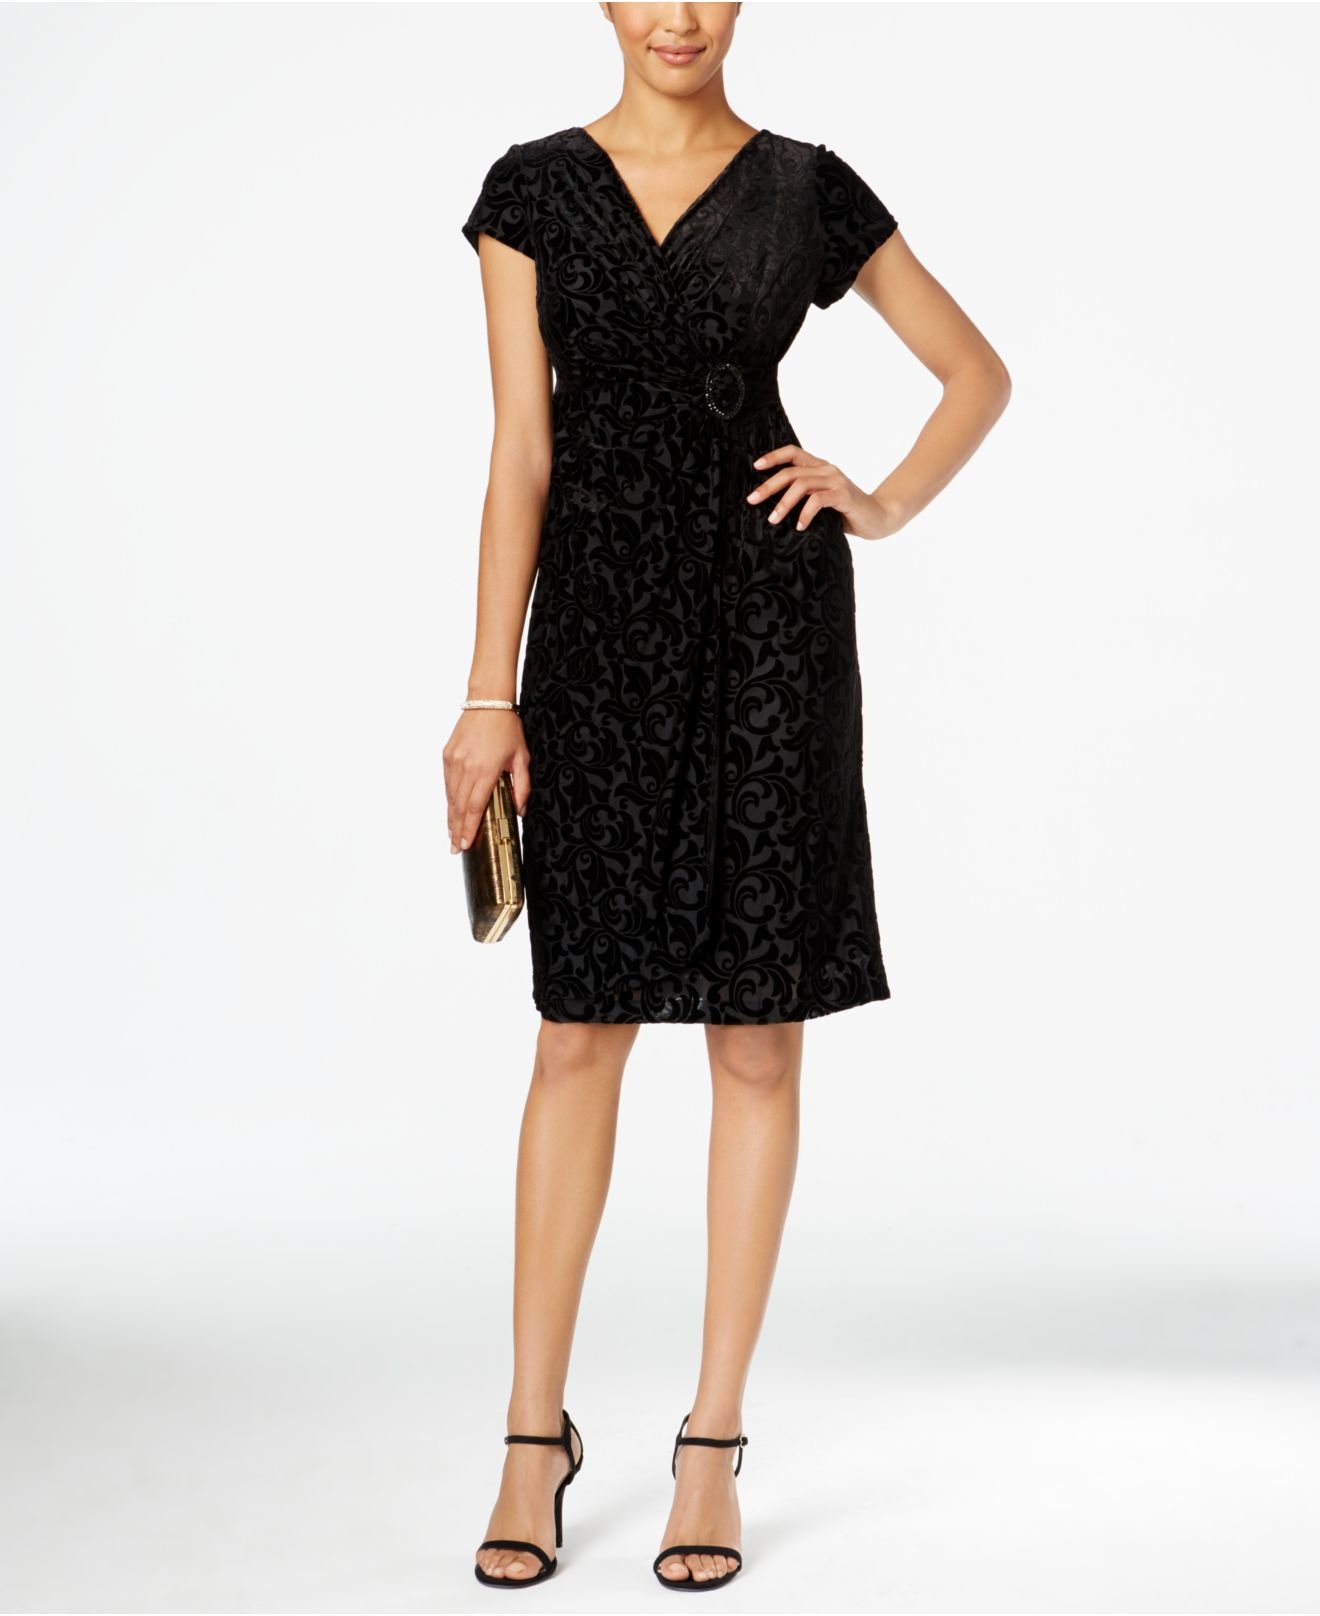 d5890856d90 Alex Evenings Petite Cap-sleeve Velvet Sheath Dress in Black - Lyst